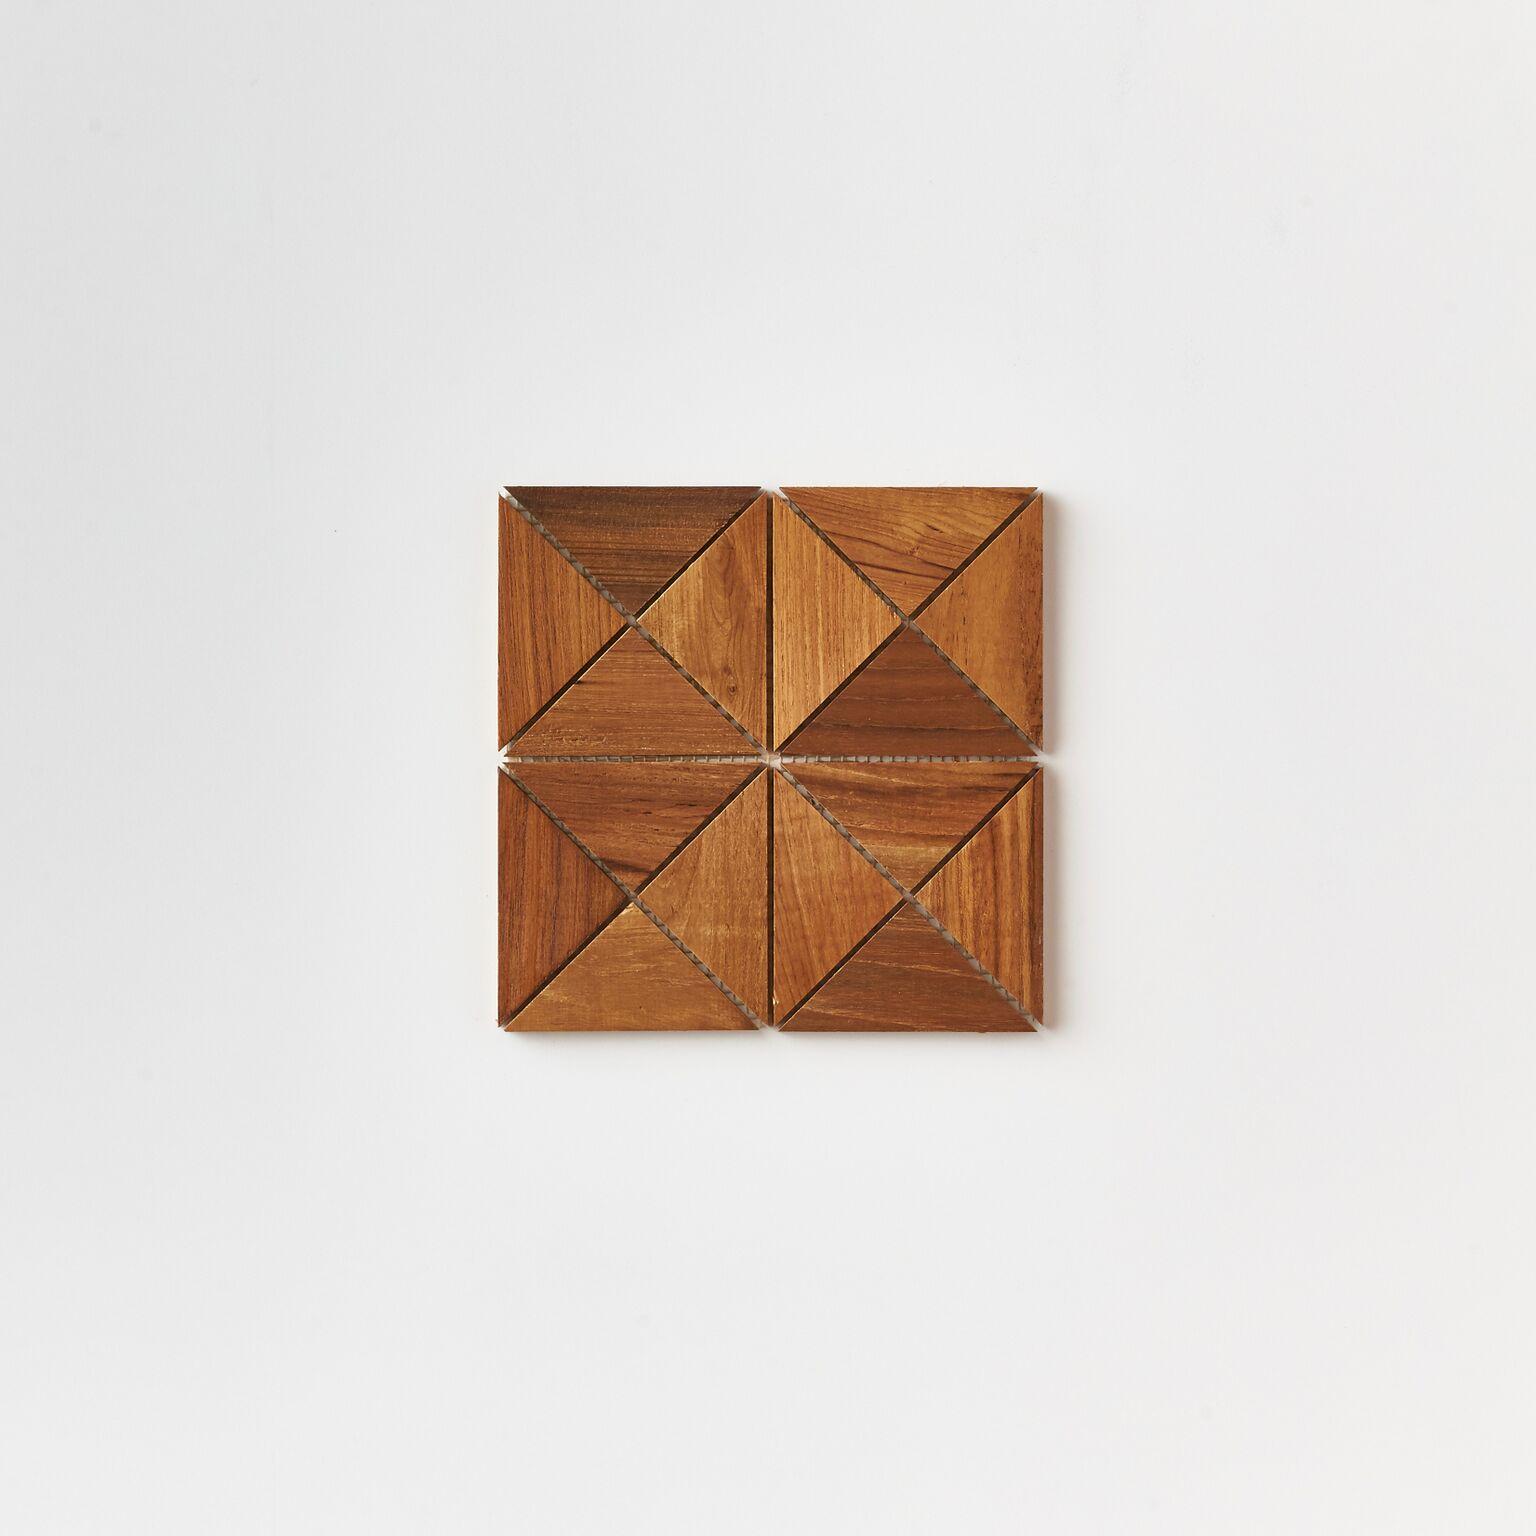 single tile - Teak Tile - Crosscut